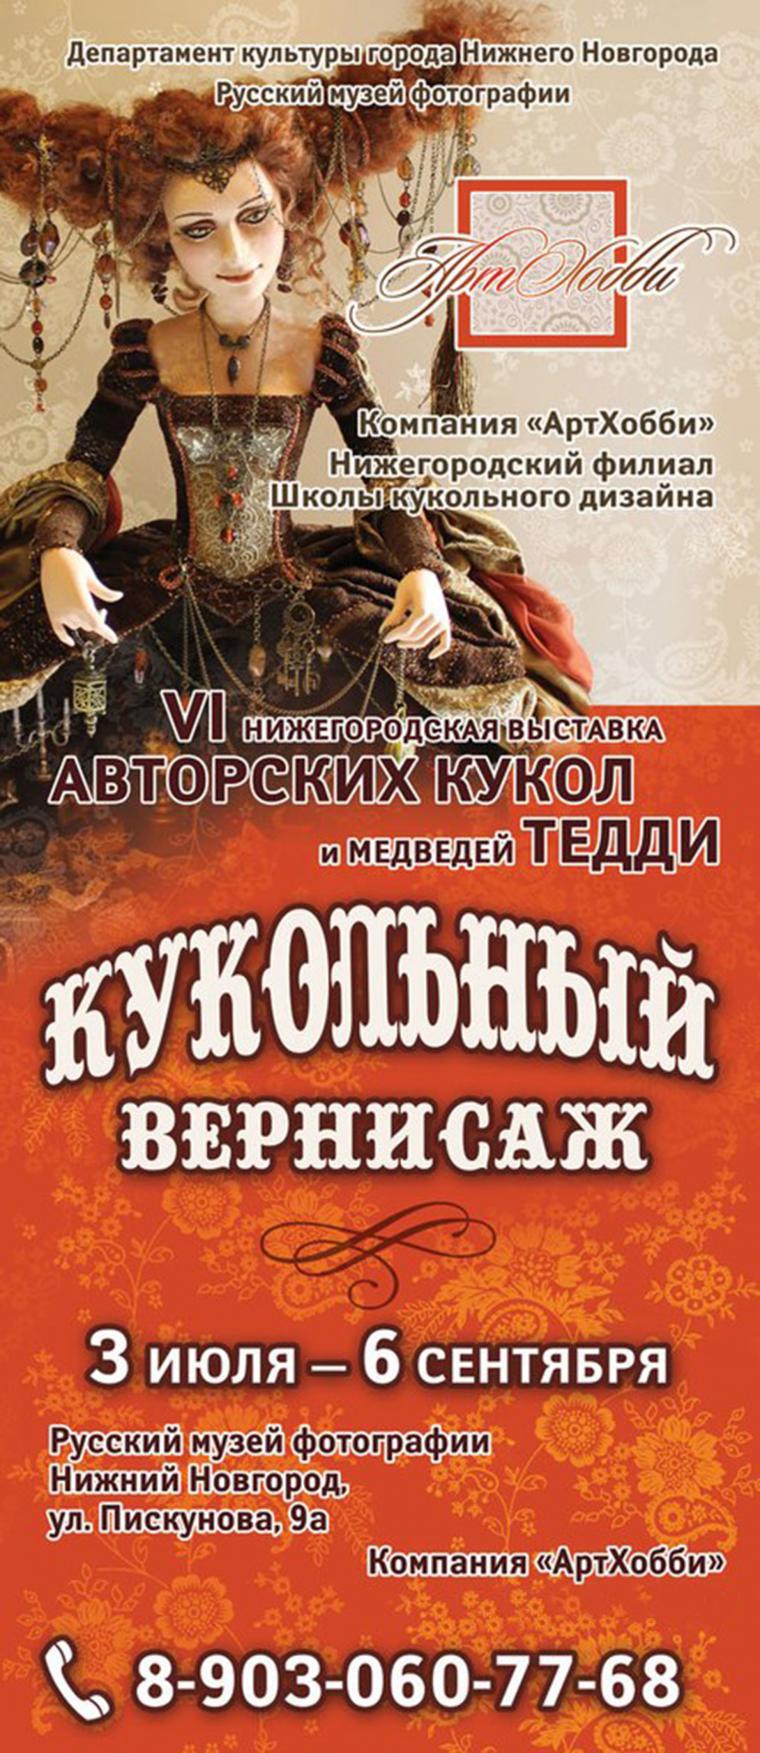 выставка, выставка кукол, выставка мишек тедди, выставка 2015, выставка в н новгороде, кукольный вернисаж